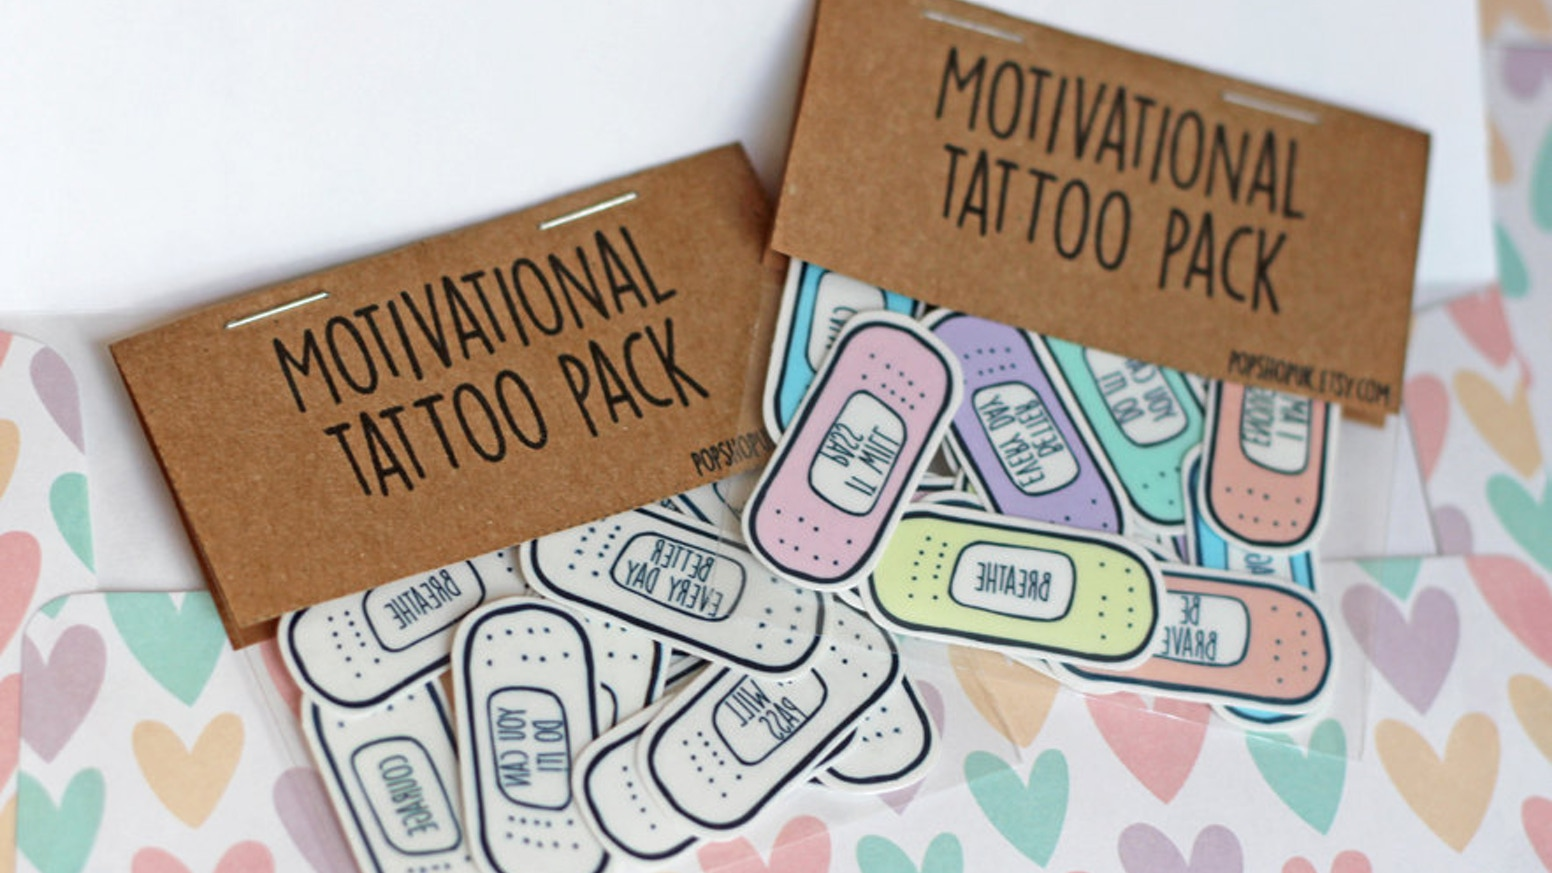 140+ Best Tiger Tattoos Designs for Men & Women